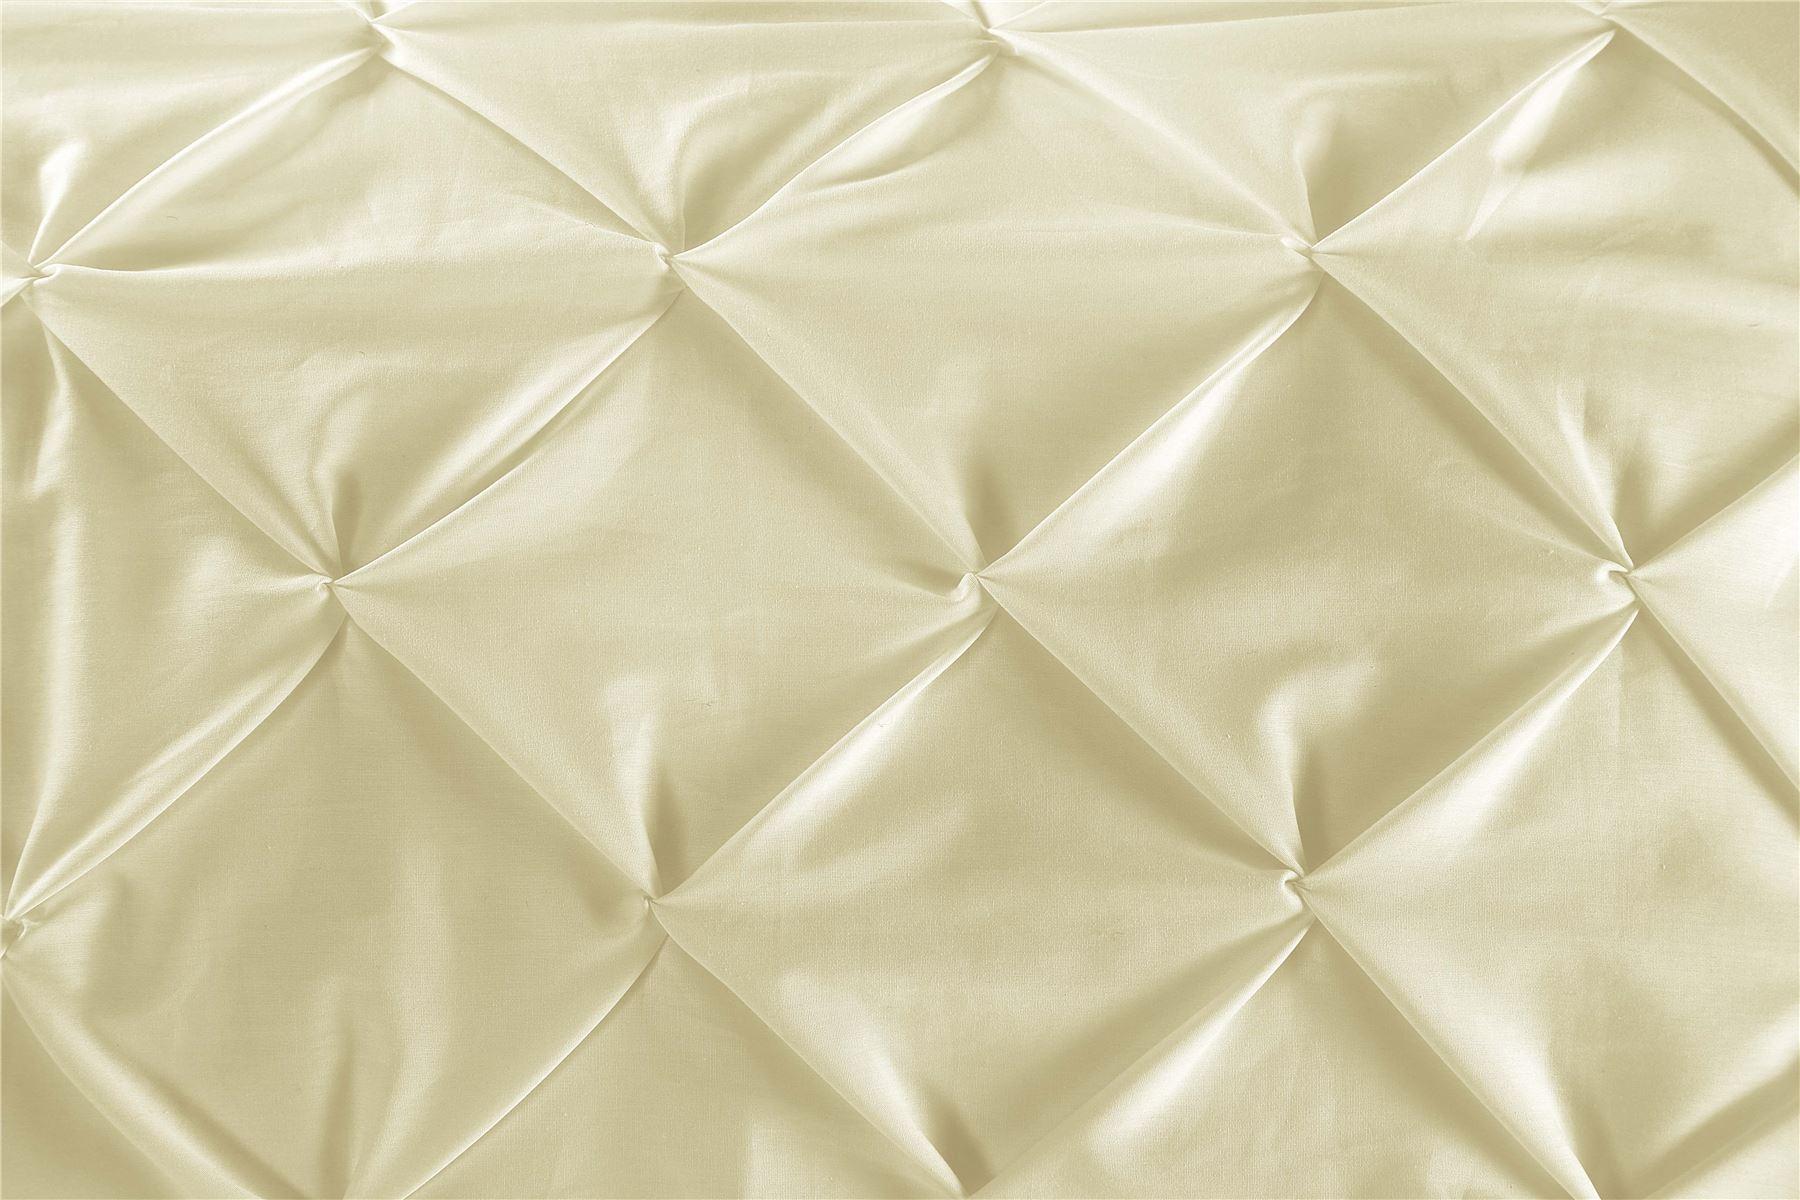 Luxury-Pure-100-Cotton-200-Thread-Pinch-Pleat-Pintuck-Puckering-Duvet-Cover-Set thumbnail 51